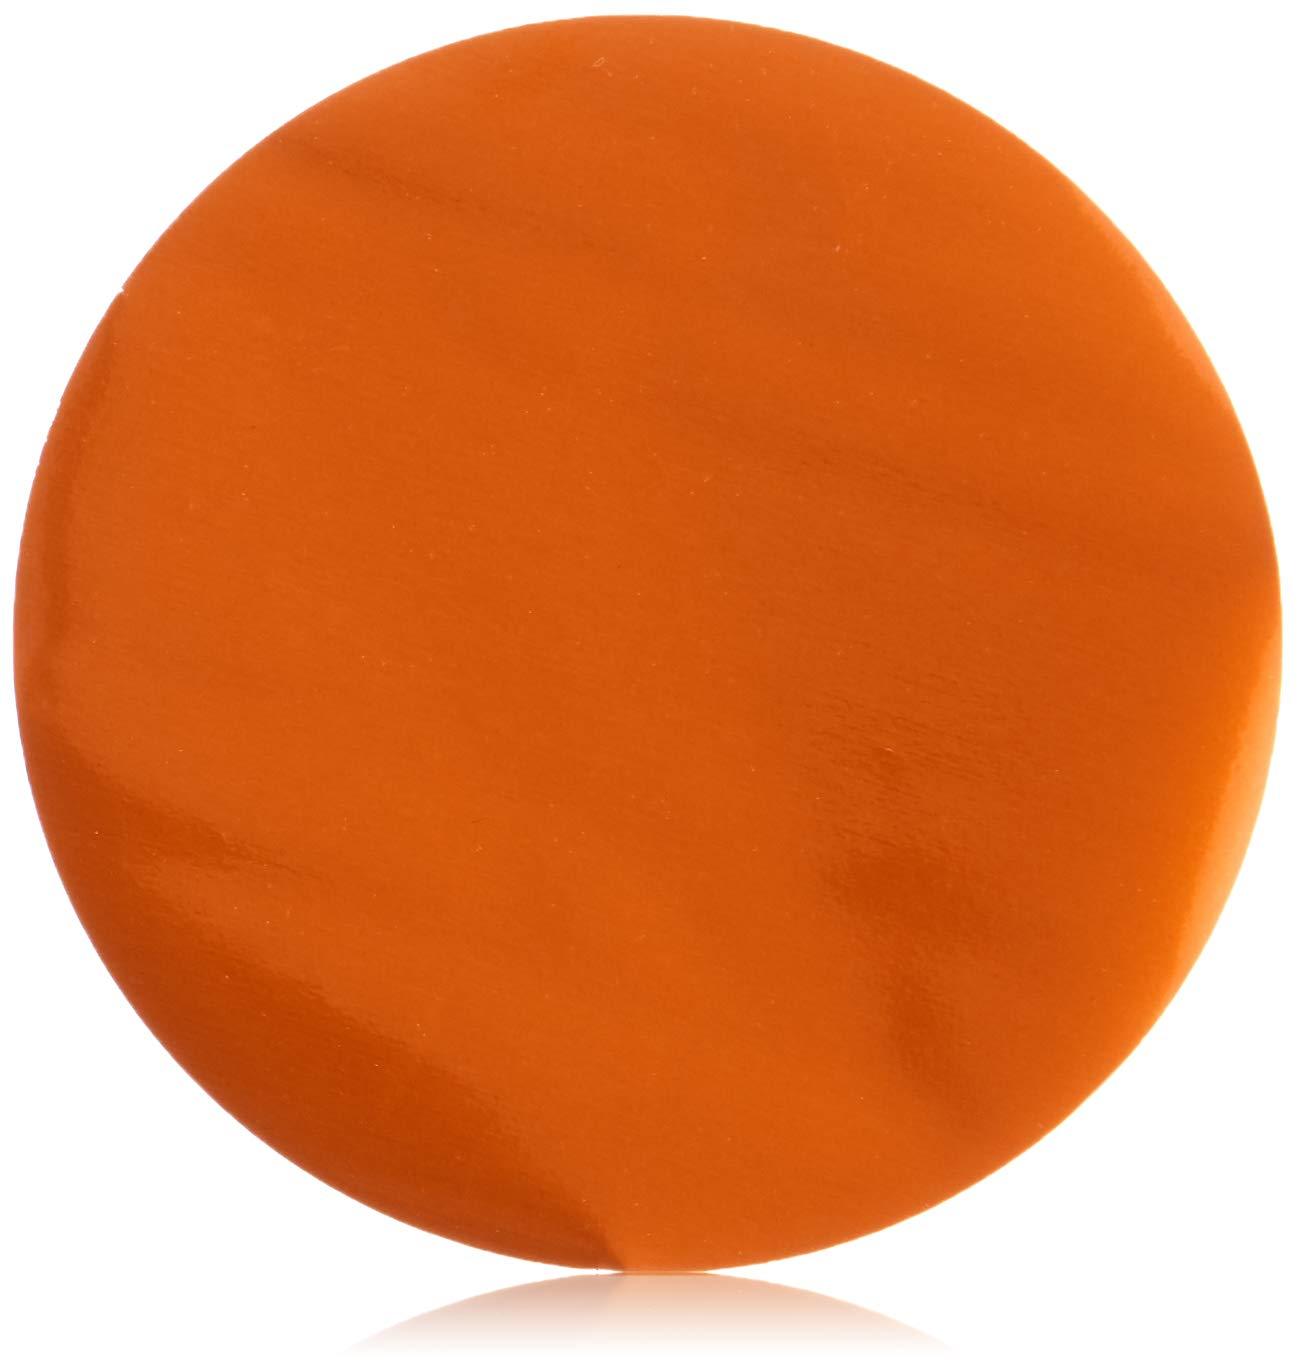 Mettoo Burnt Orange Body Foil Pro, 500 Count